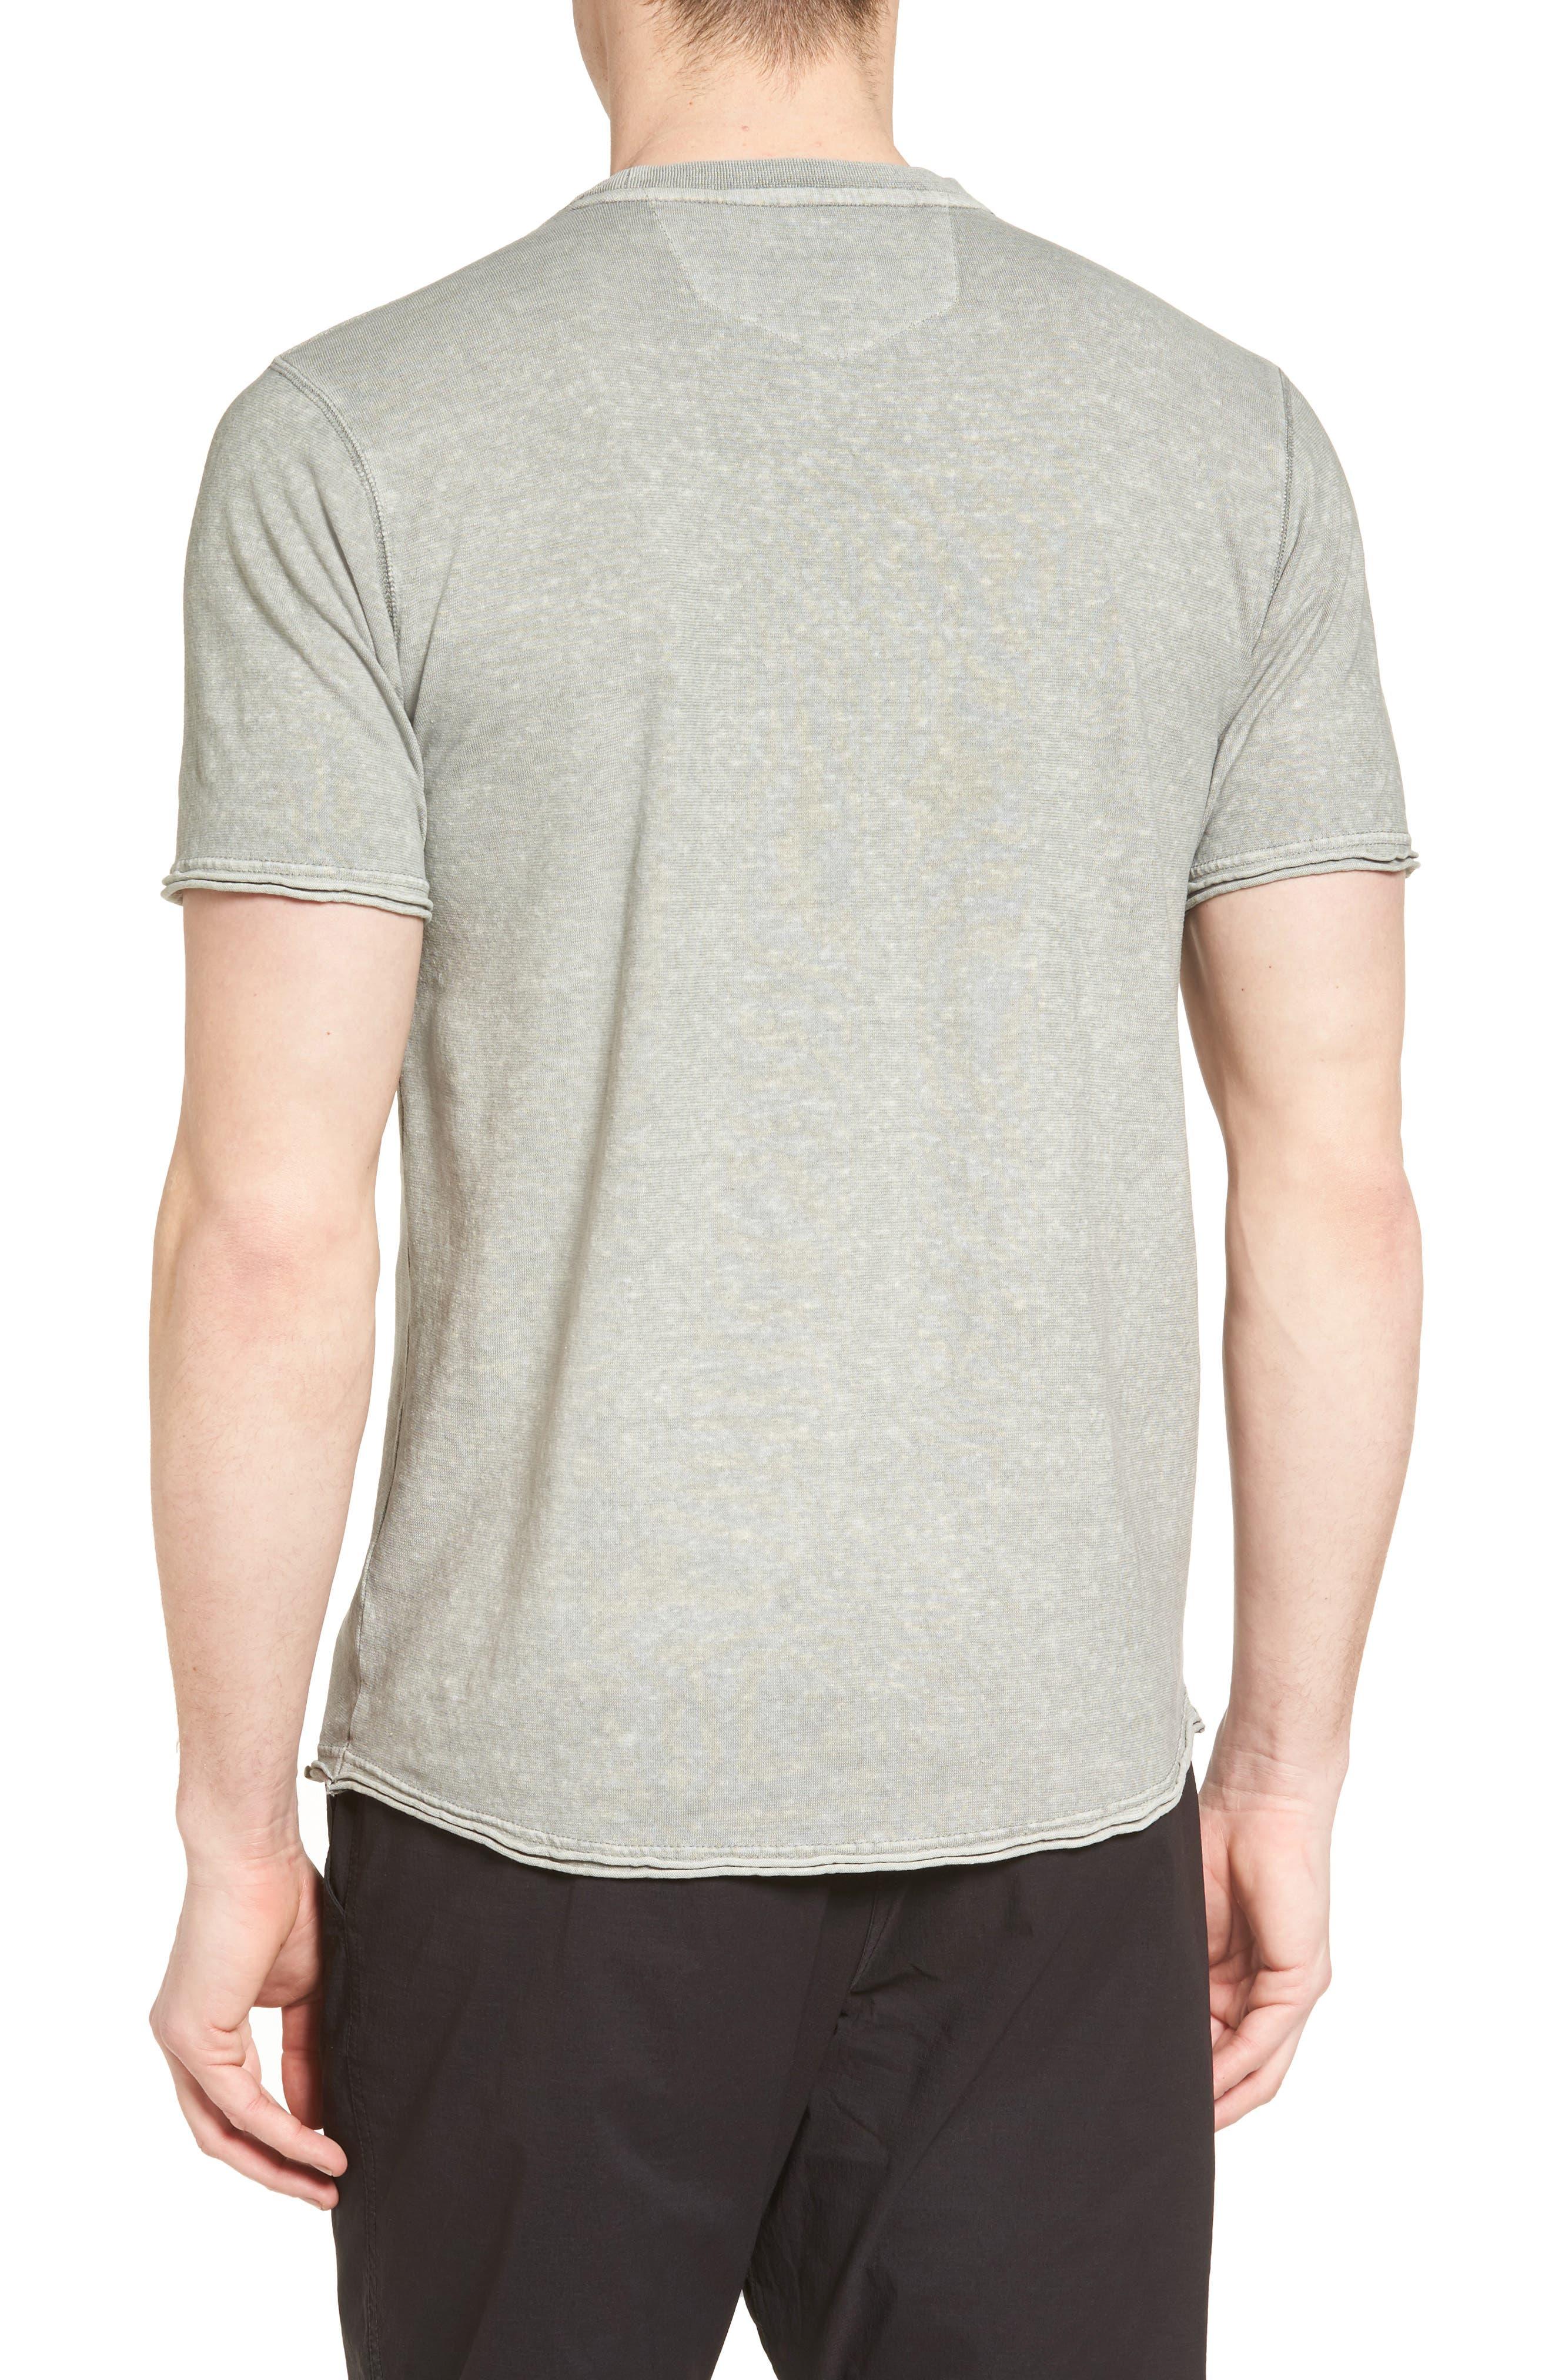 Camura T-Shirt,                             Alternate thumbnail 2, color,                             021